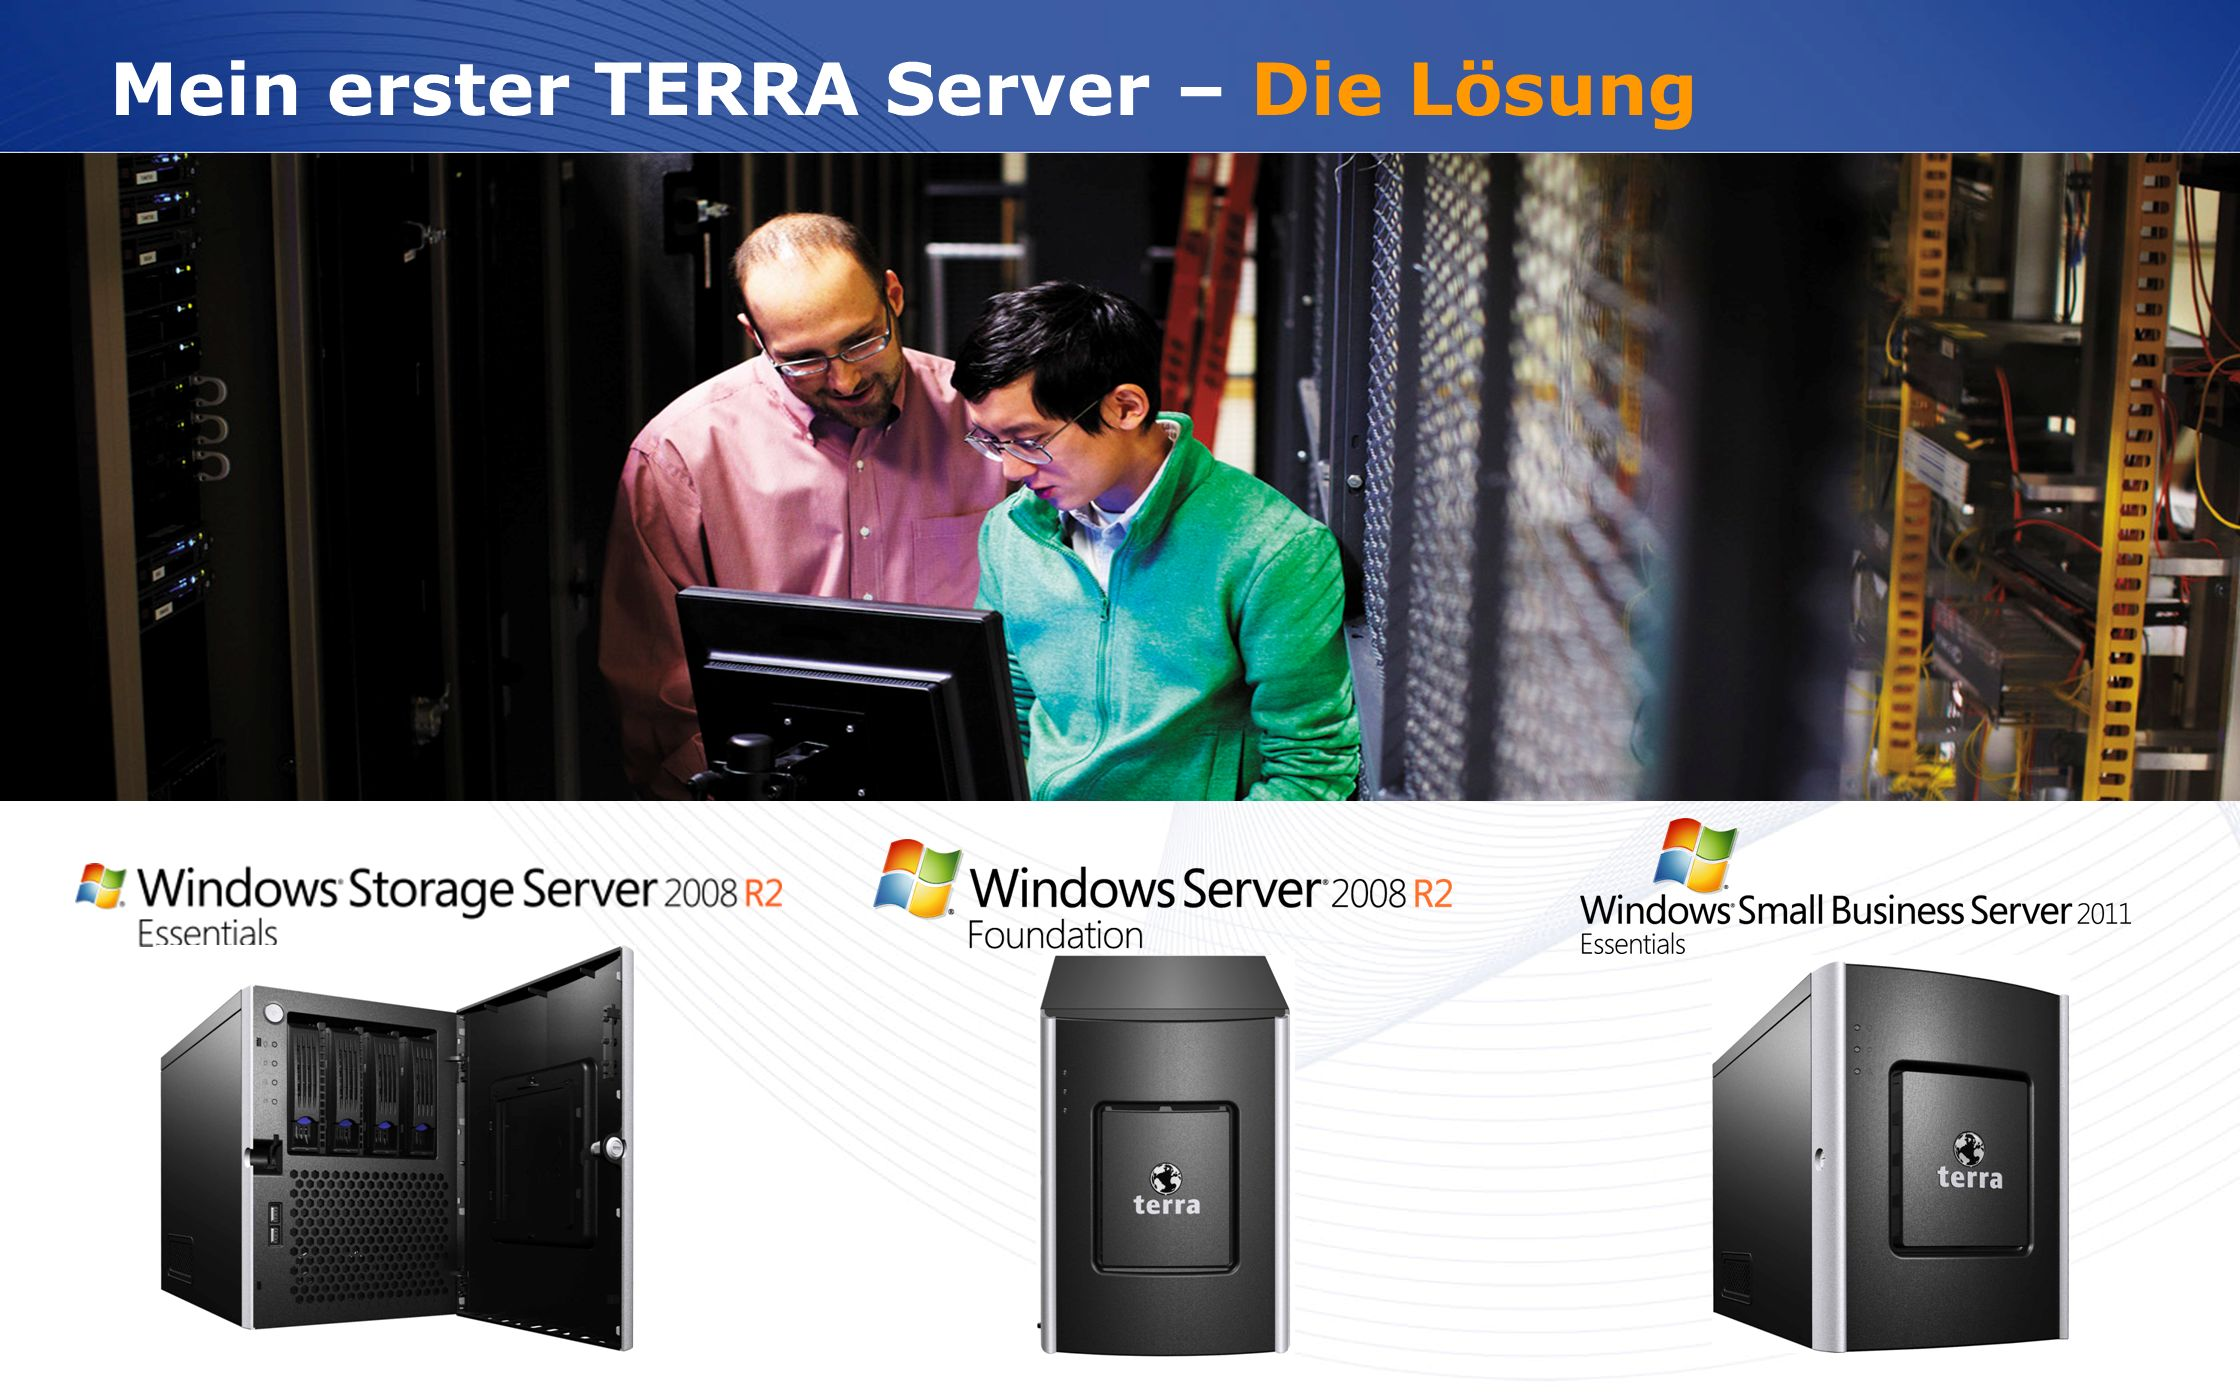 Mein erster TERRA Server – Die Lösung